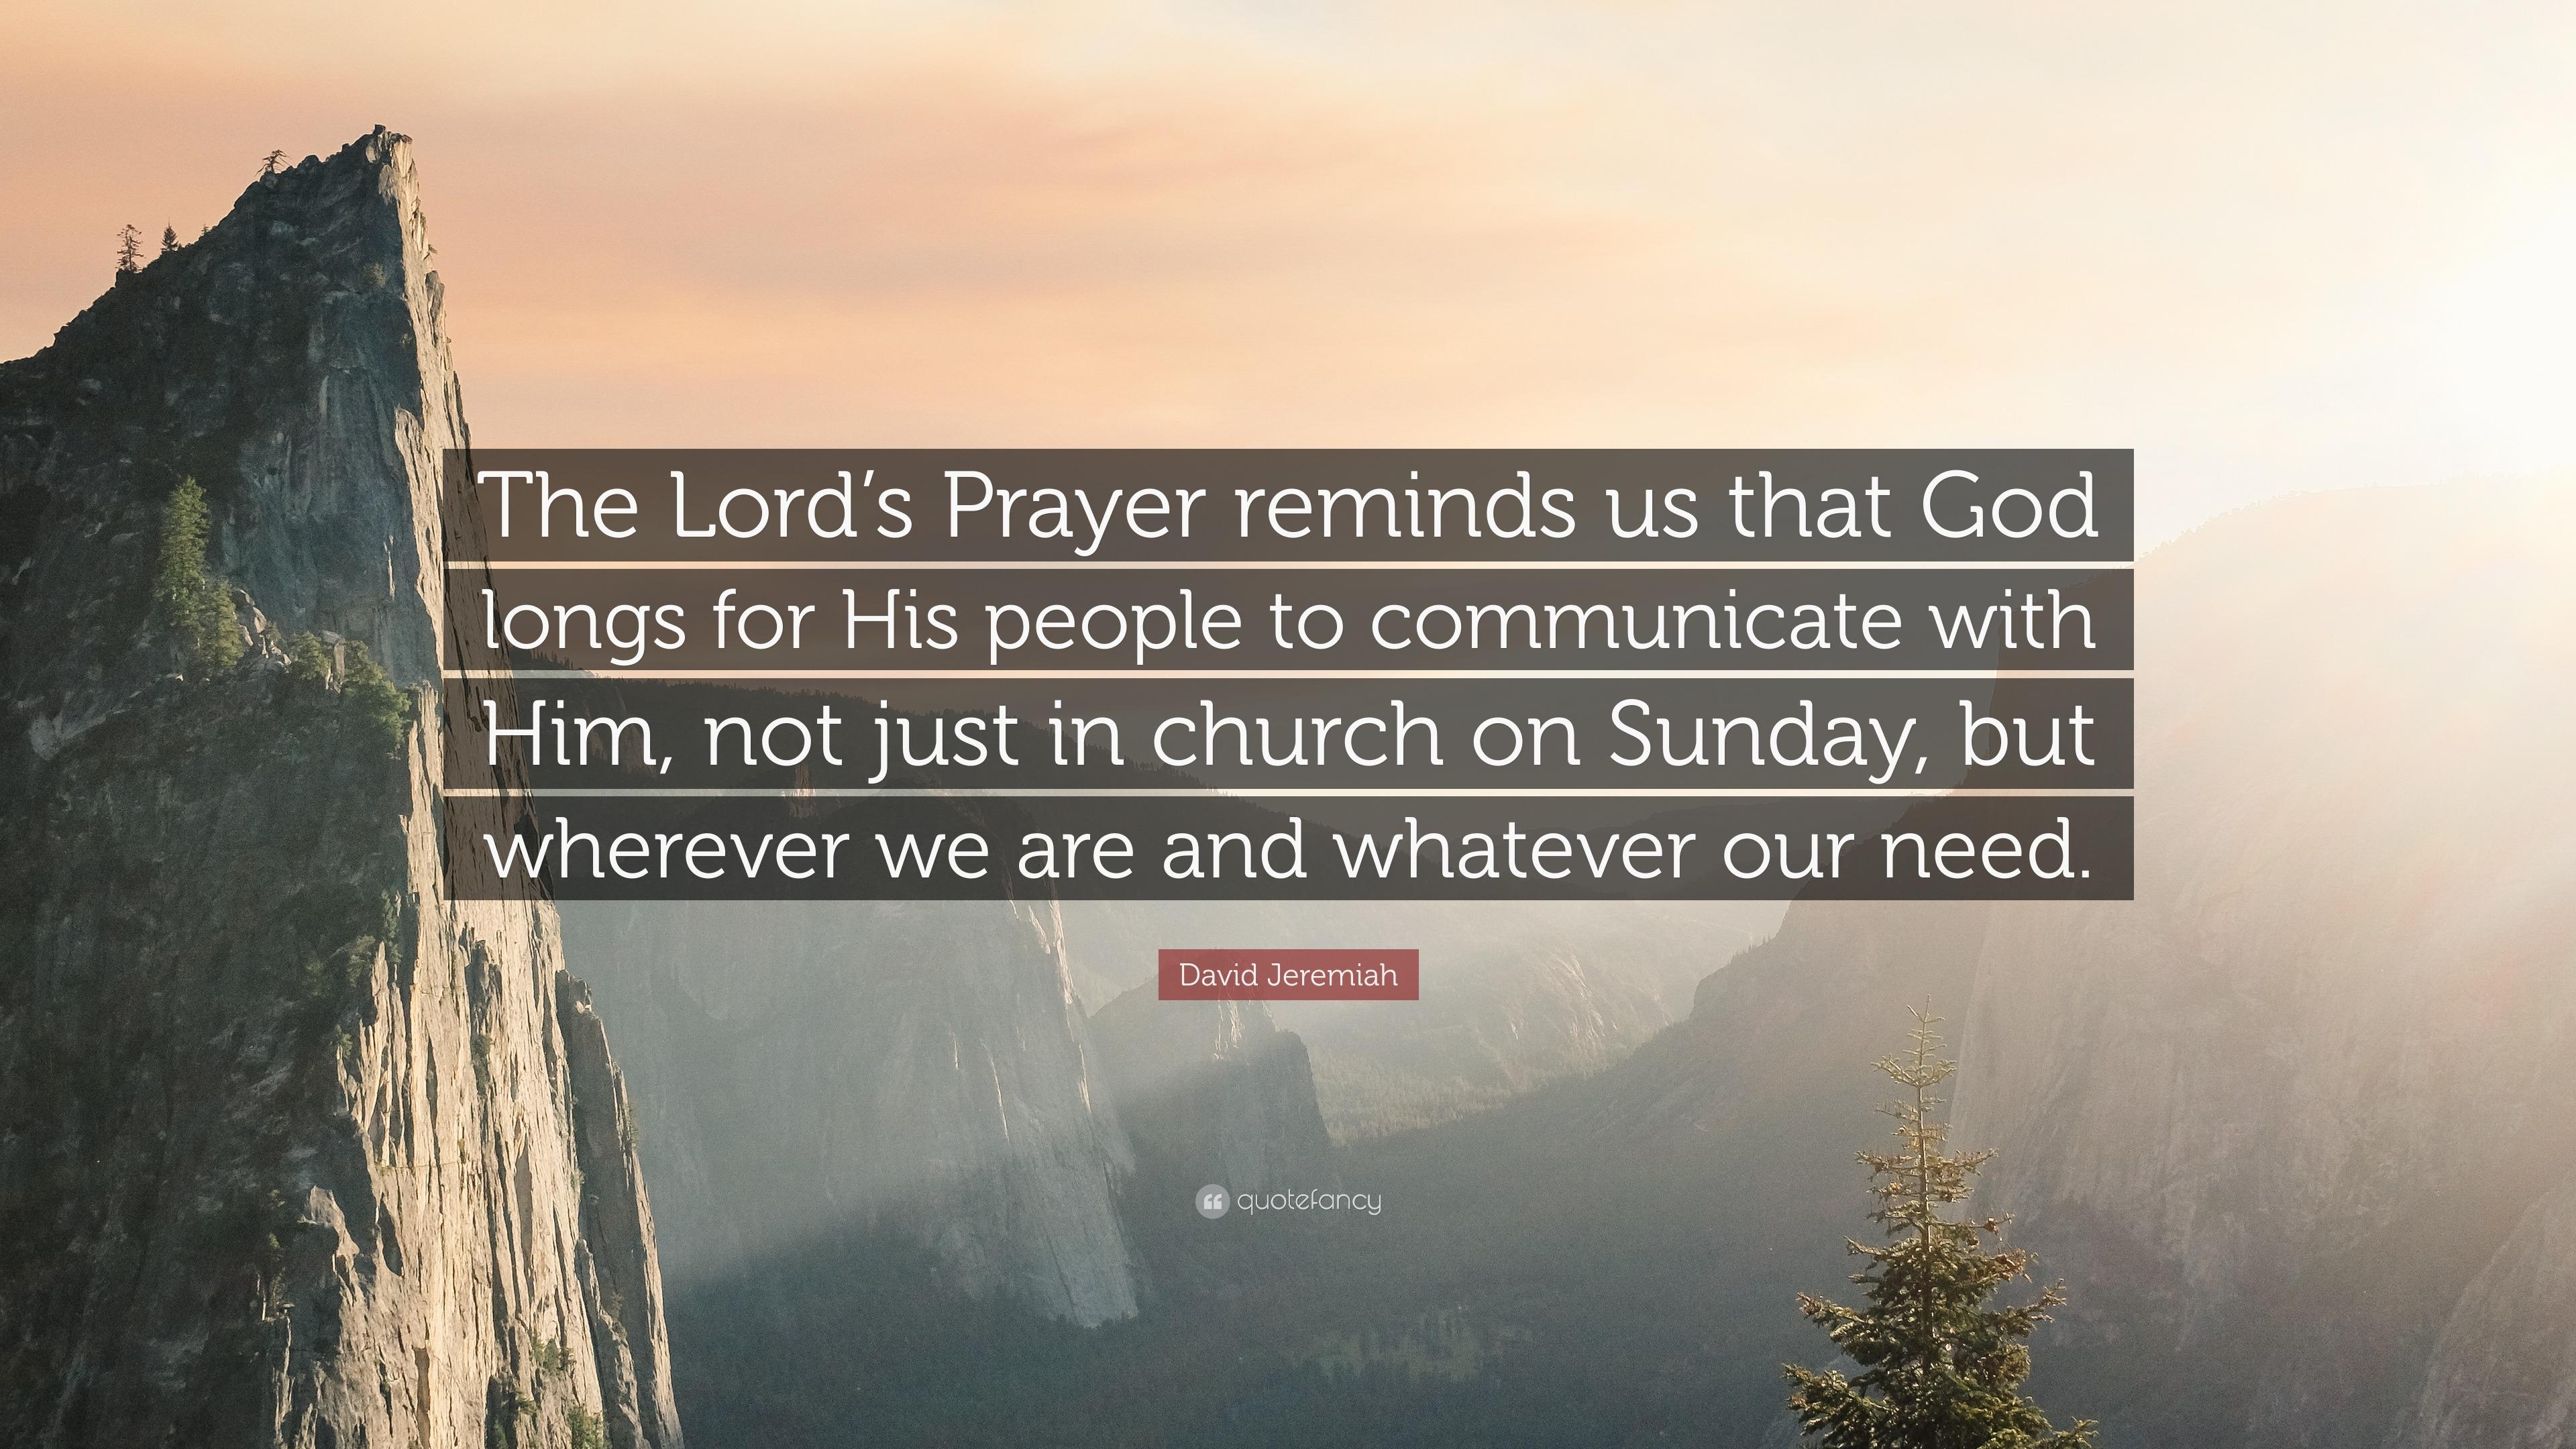 david jeremiah quote u201cthe lord u0027s prayer reminds us that god longs